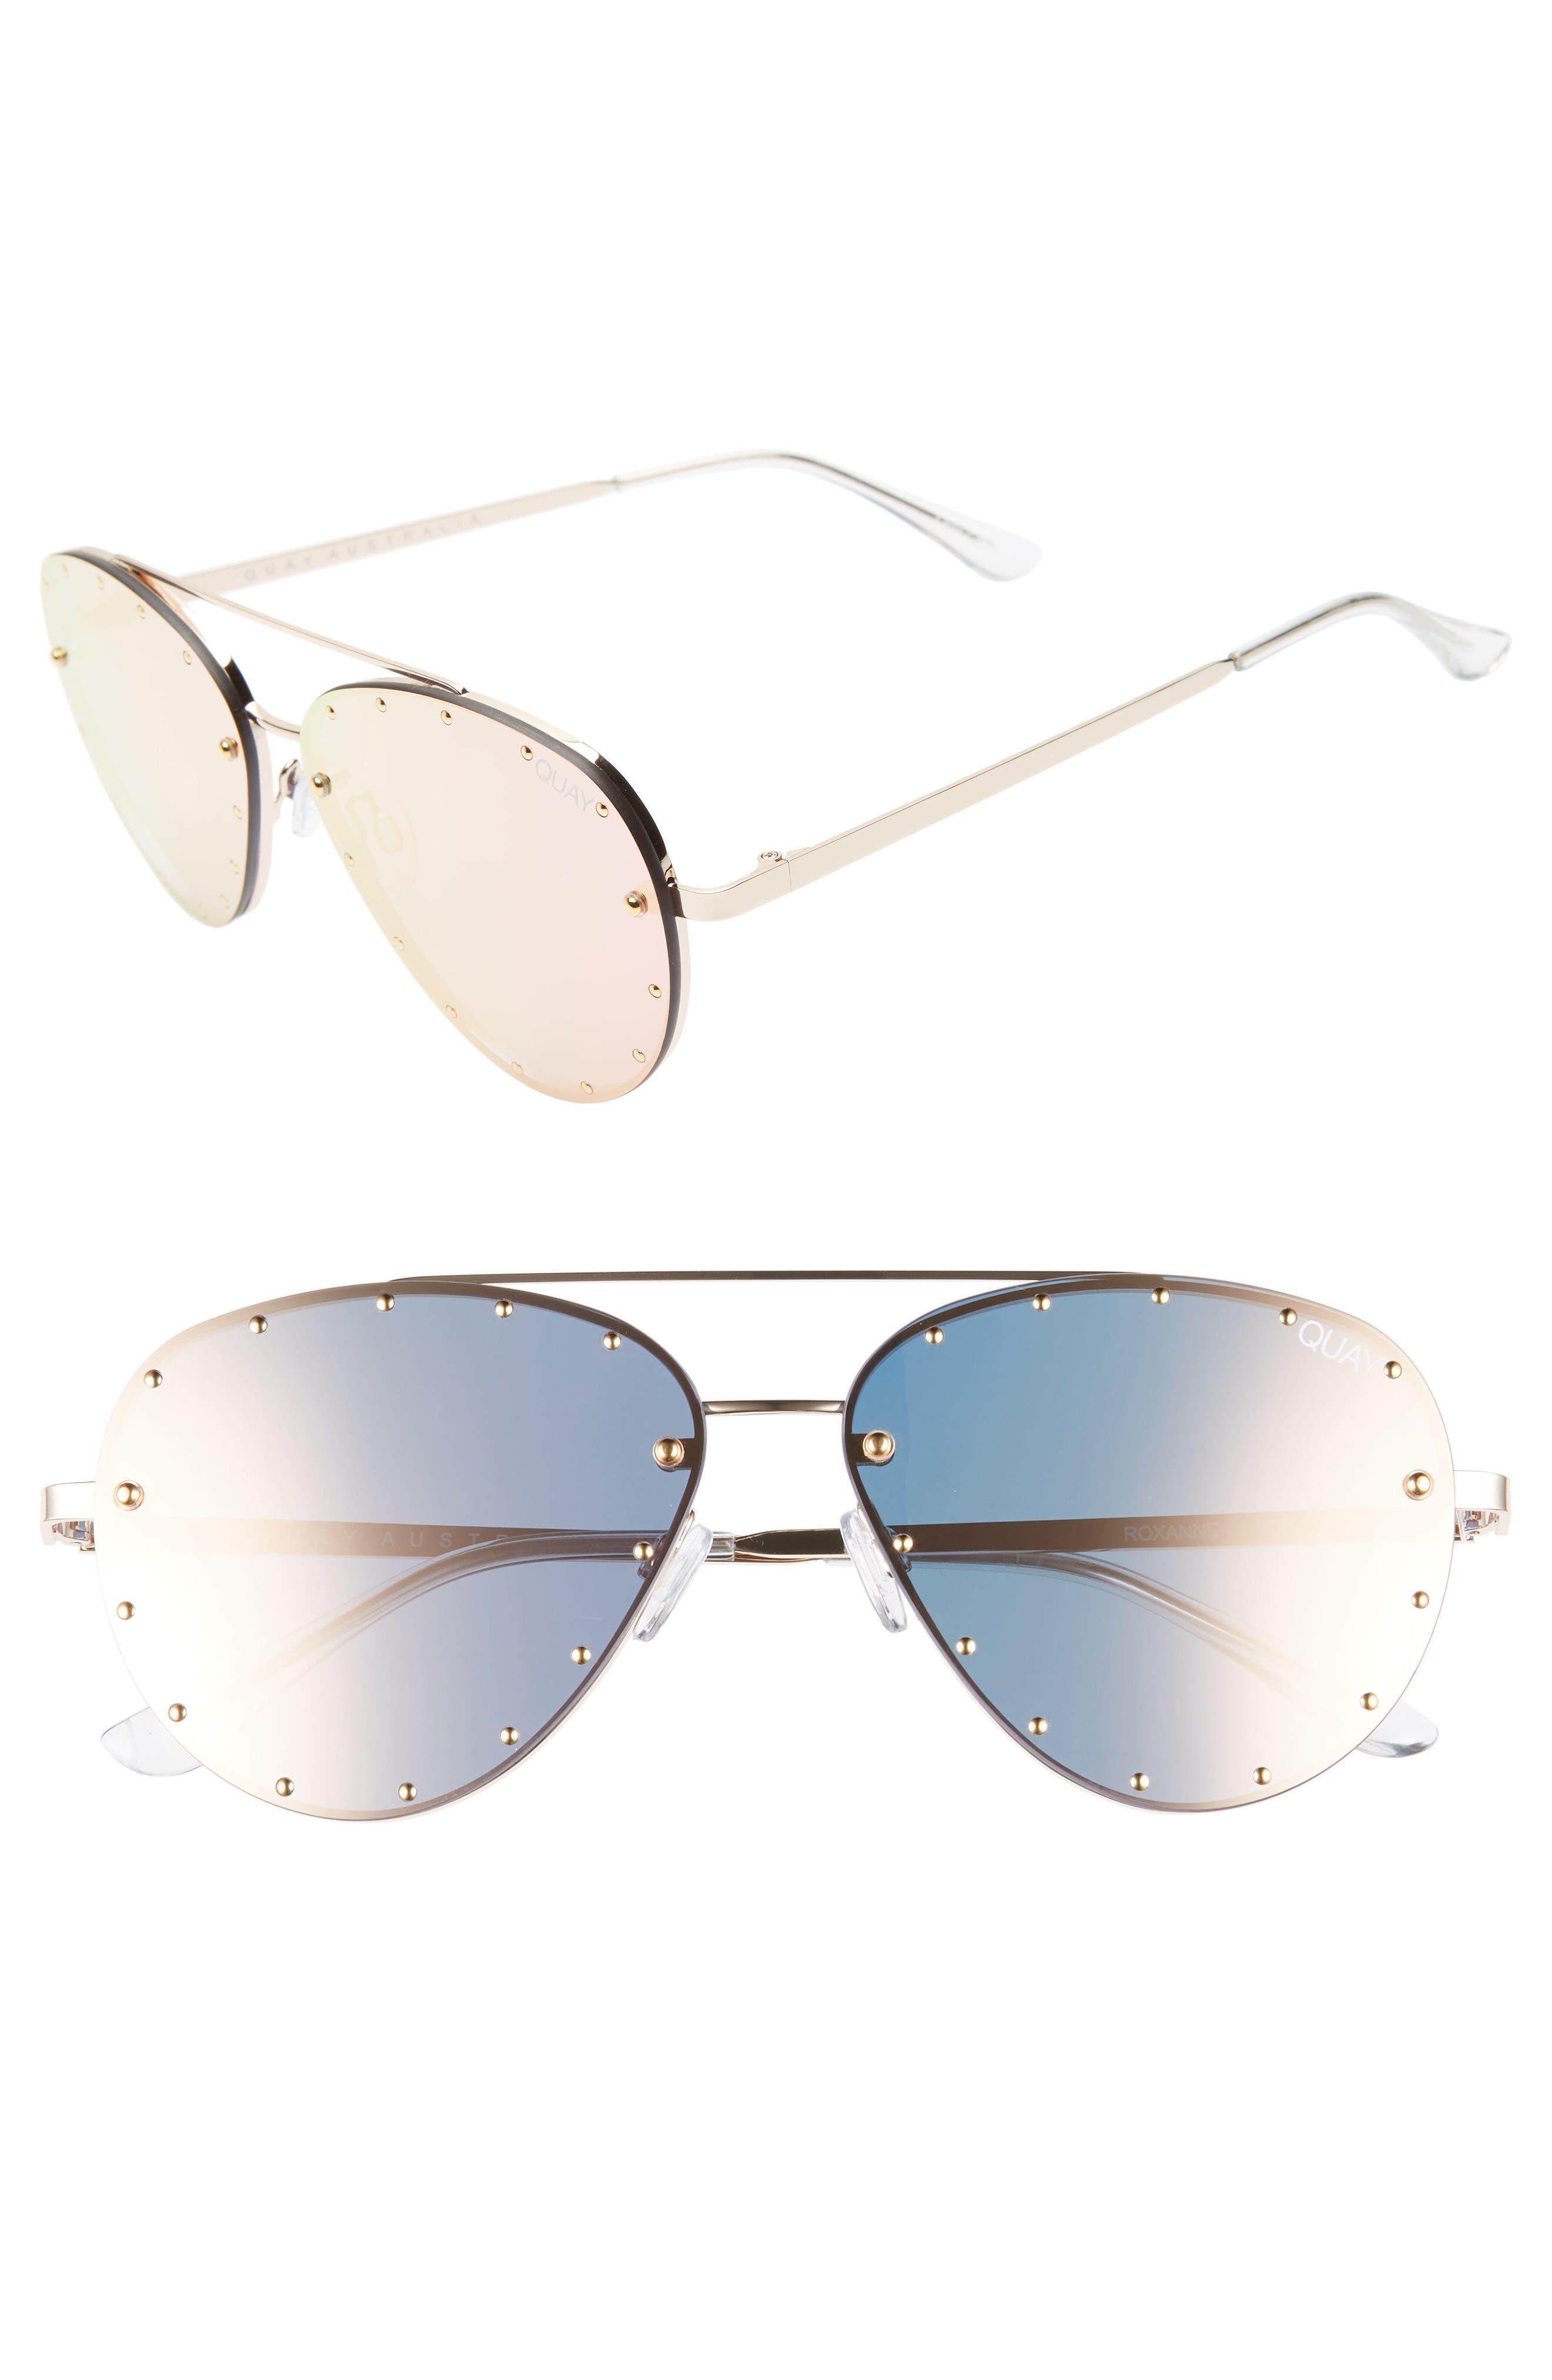 x Jaclyn Hill Roxanne 62mm Stud Aviator Sunglasses,                             Main thumbnail 1, color,                             GOLD / ROSE